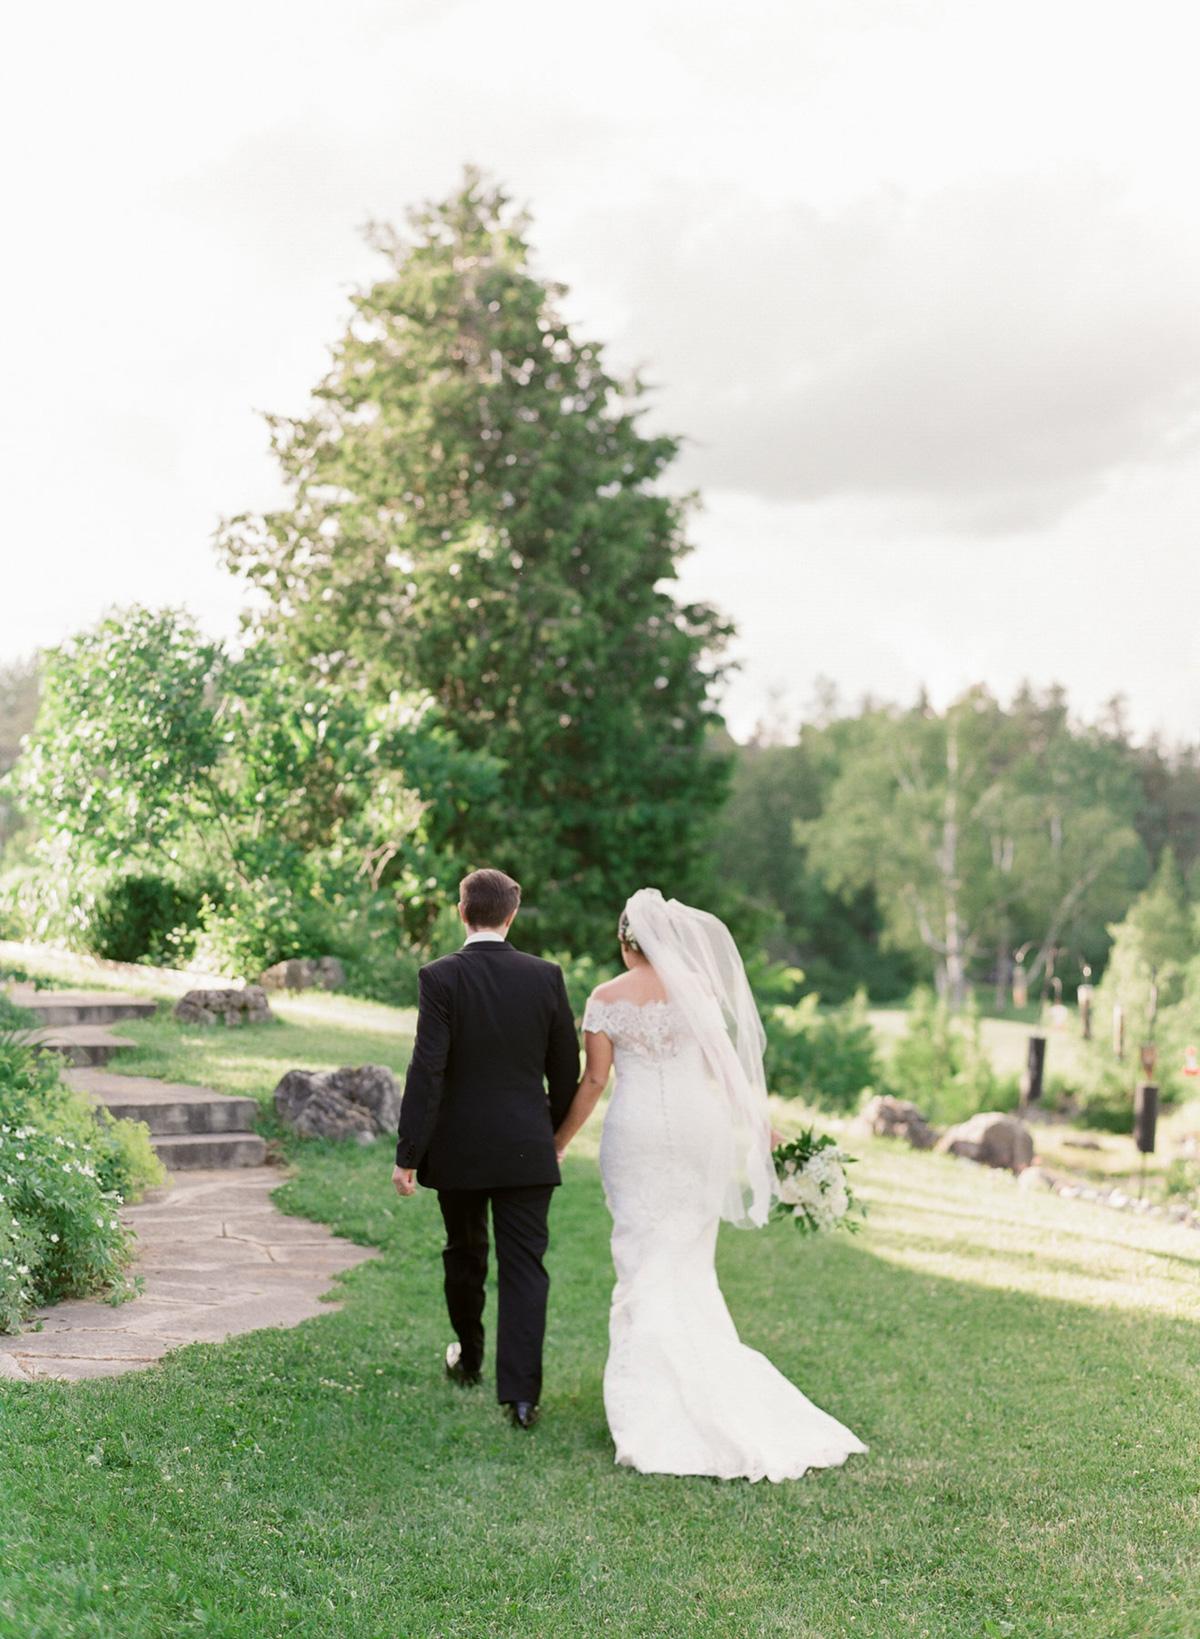 artiese-studios-vineyard-bride-swish-list-private-estate-cambridge-wedding-58.jpg